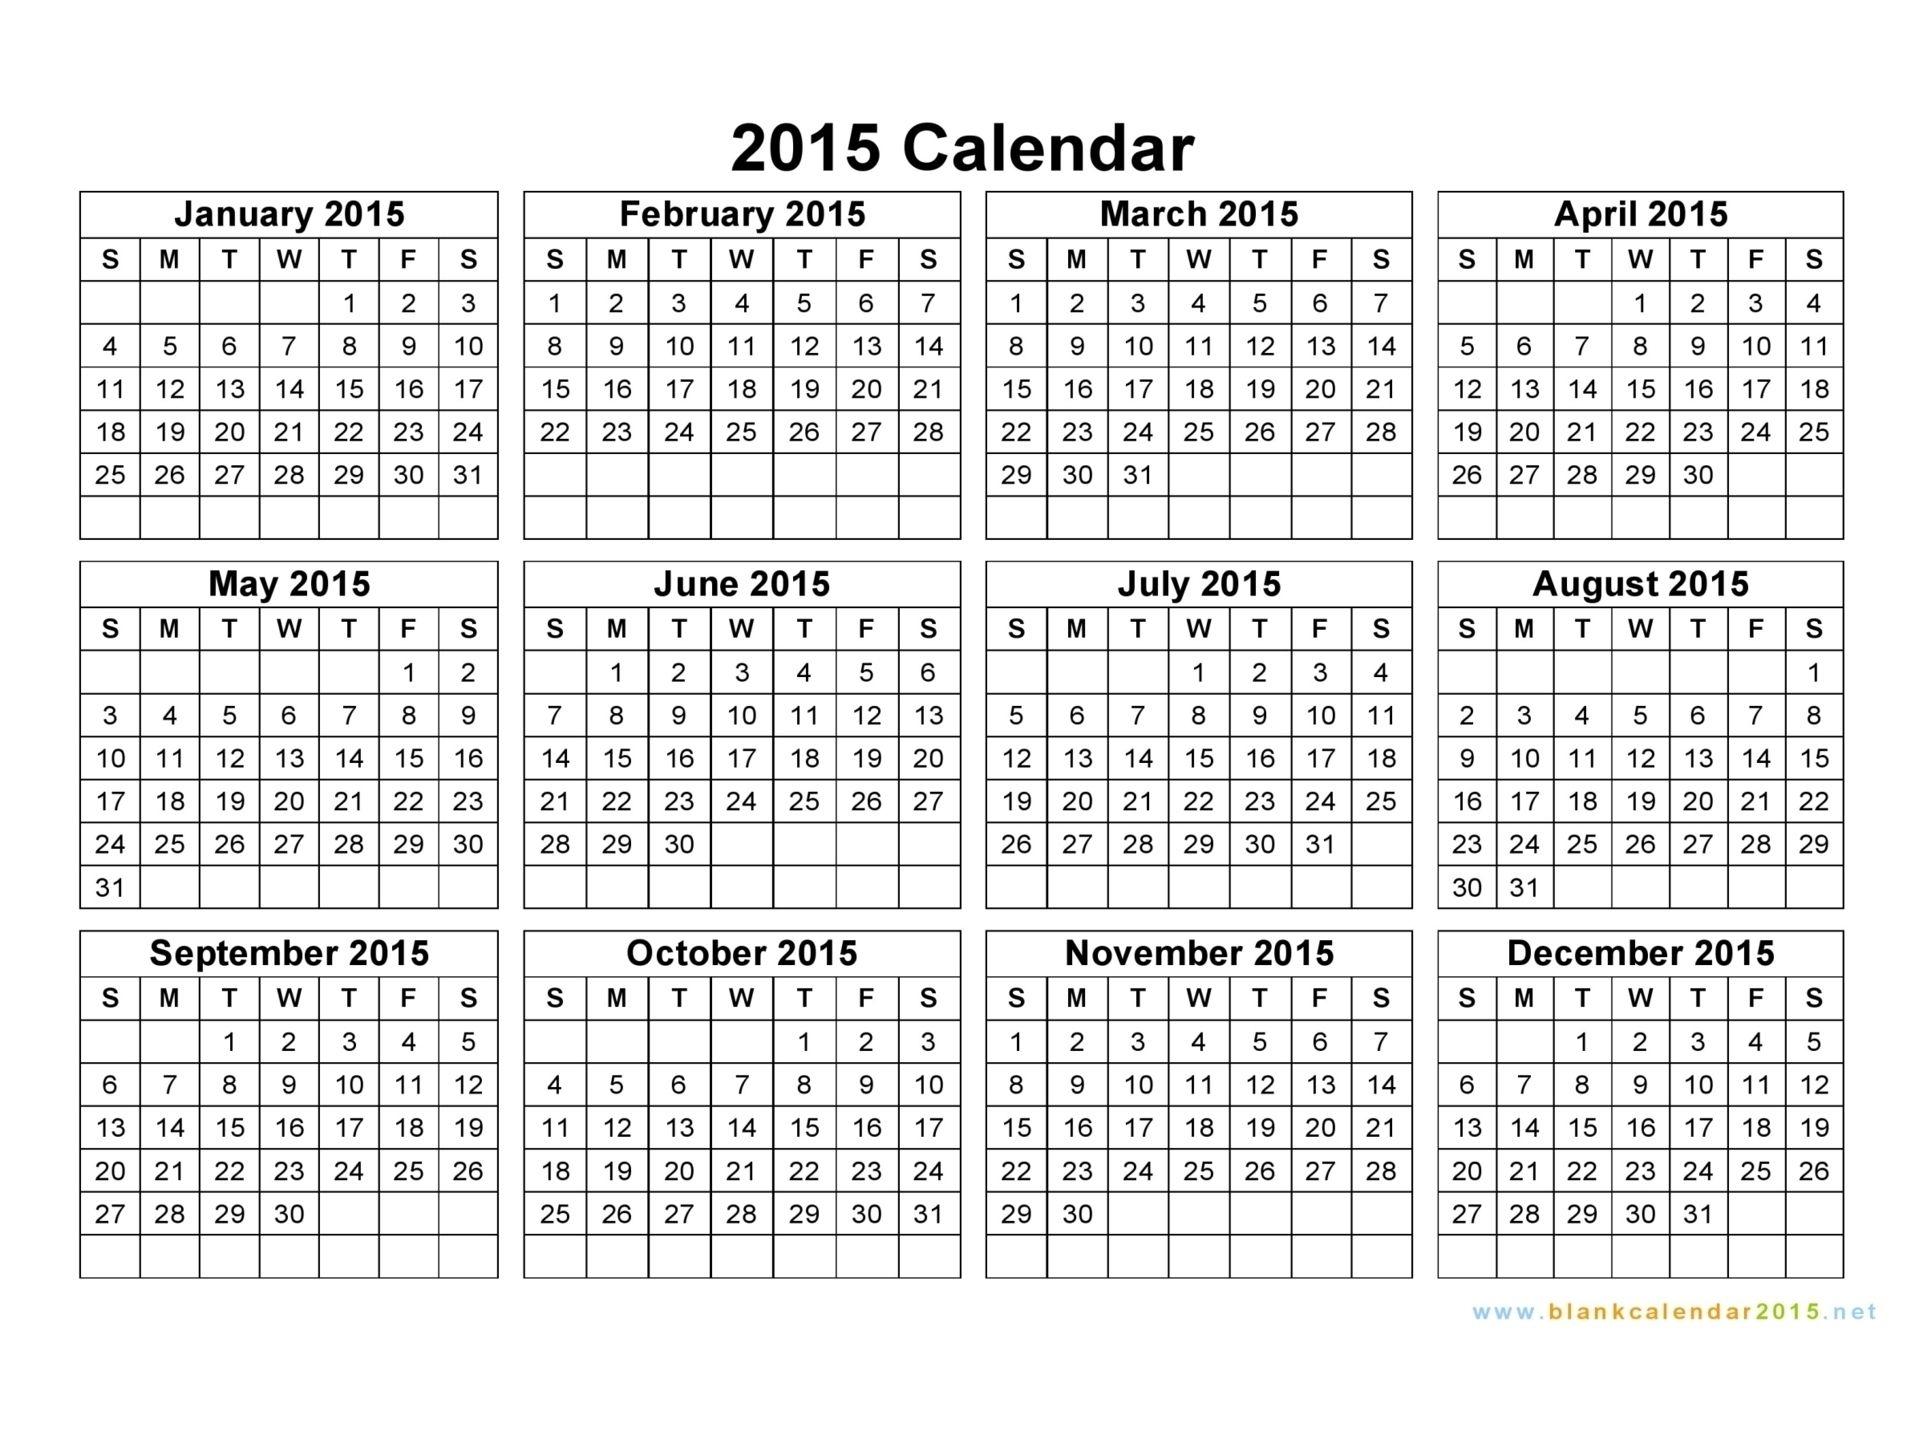 5 year calendar on one page | ten free printable calendar